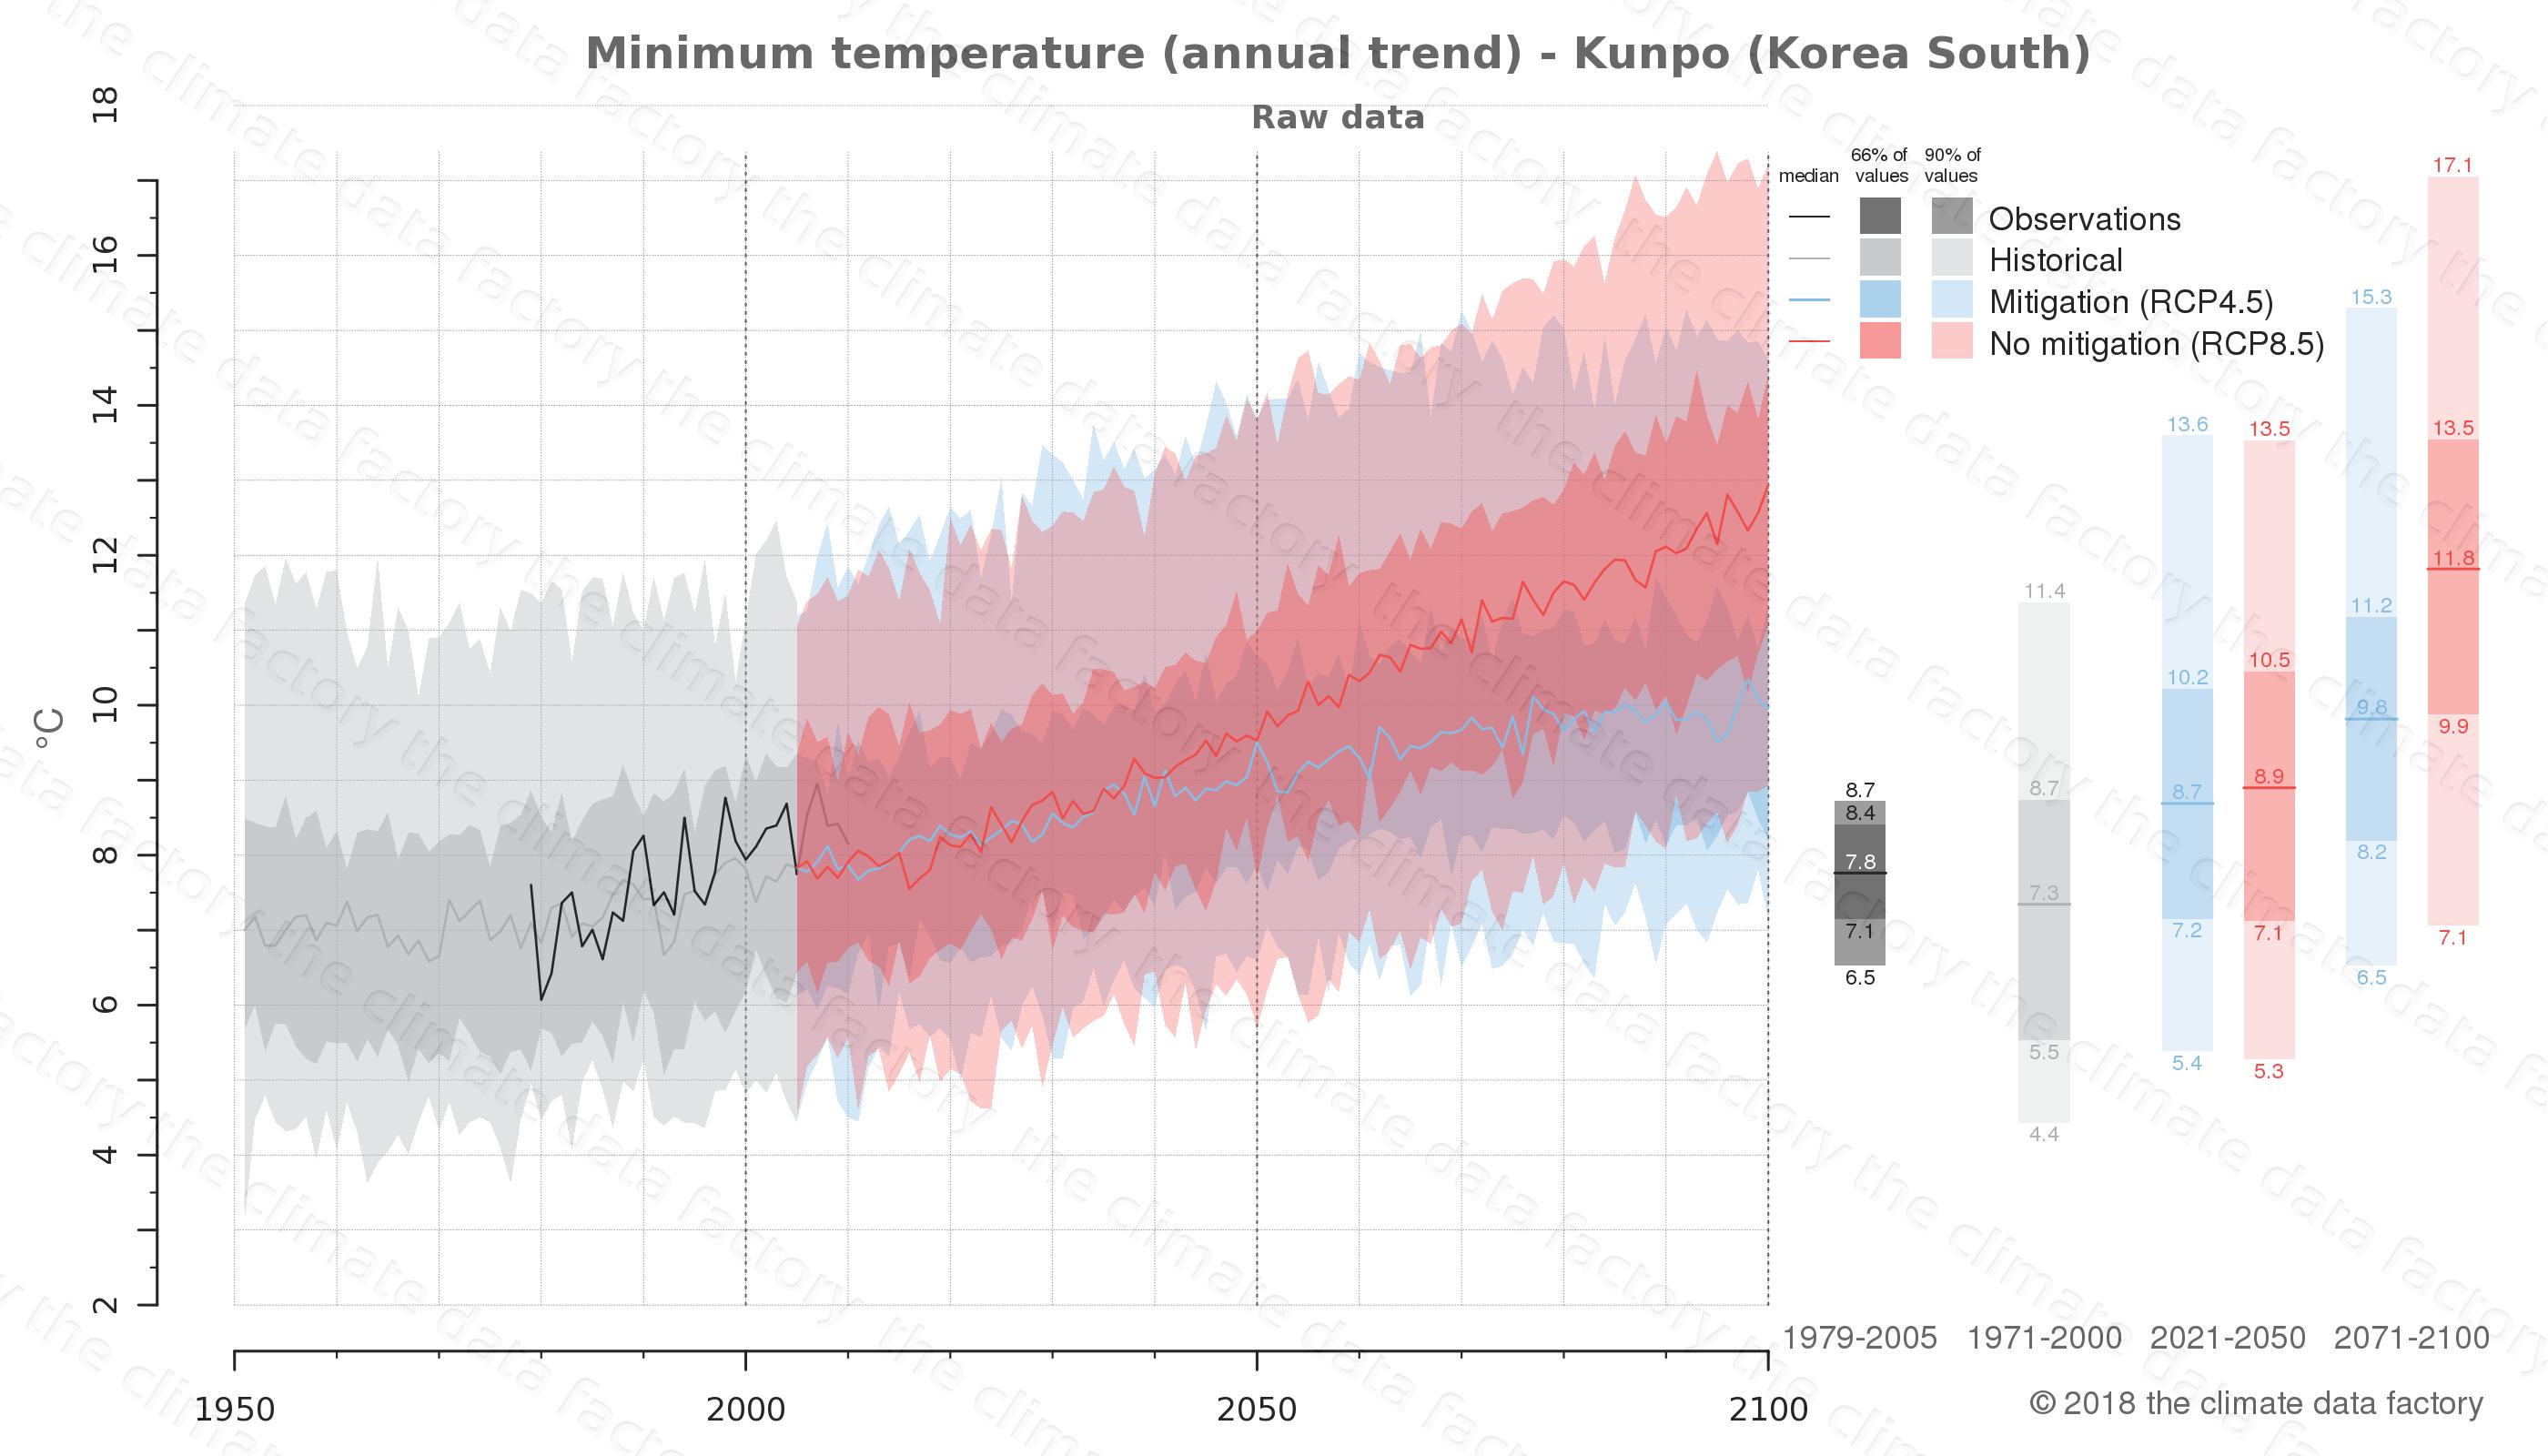 climate change data policy adaptation climate graph city data minimum-temperature kunpo south korea